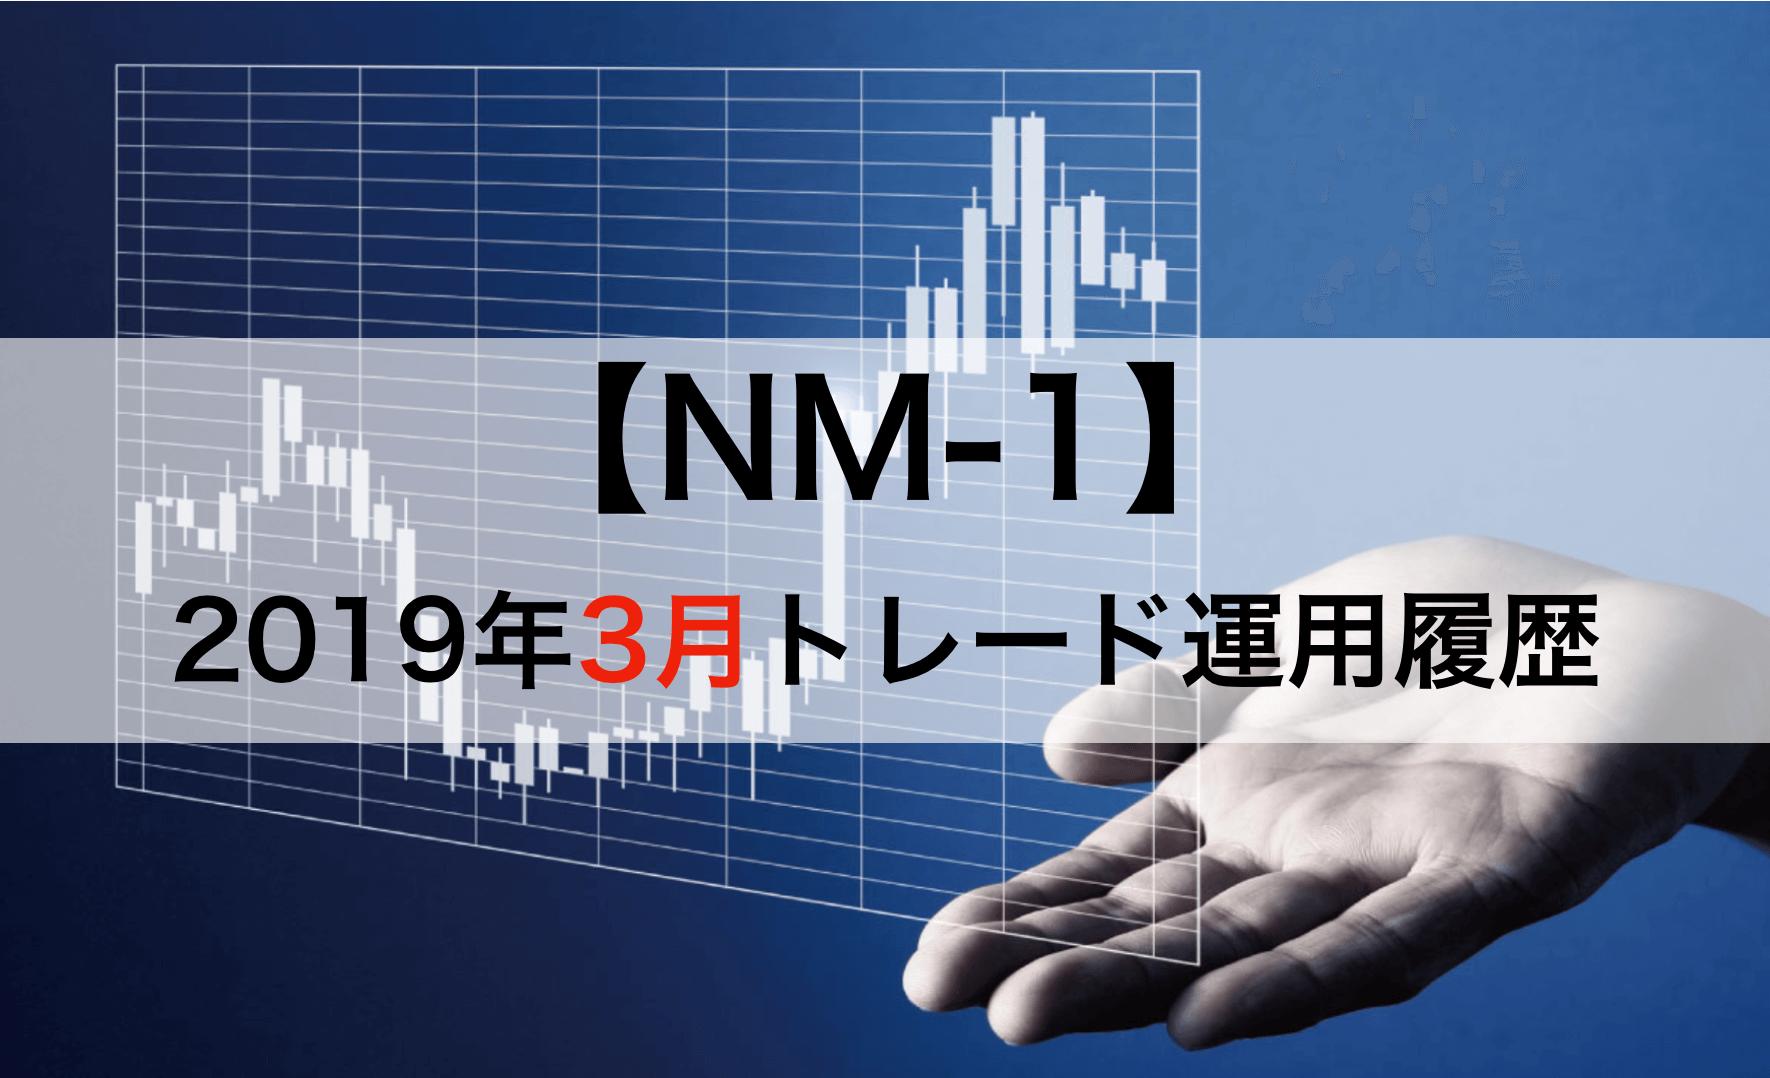 2019年3月のNM-1自動売買結果